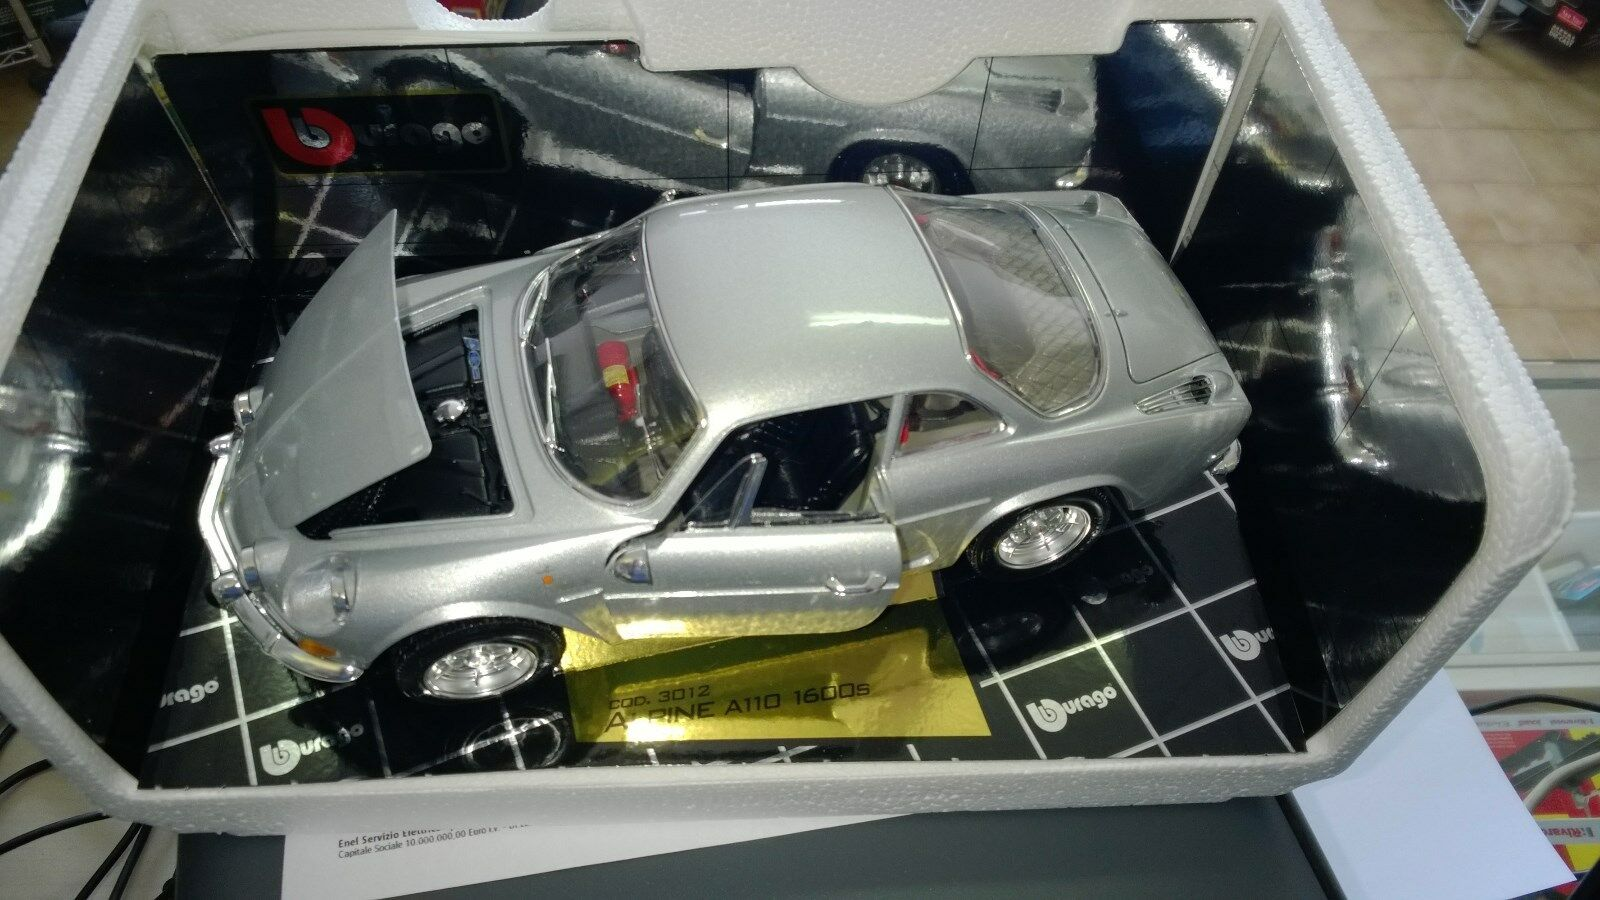 BURAGO 1 16 AUTO DIE CAST ALPINE A110 1600S 1971  MADE IN ITALY  ART 3012